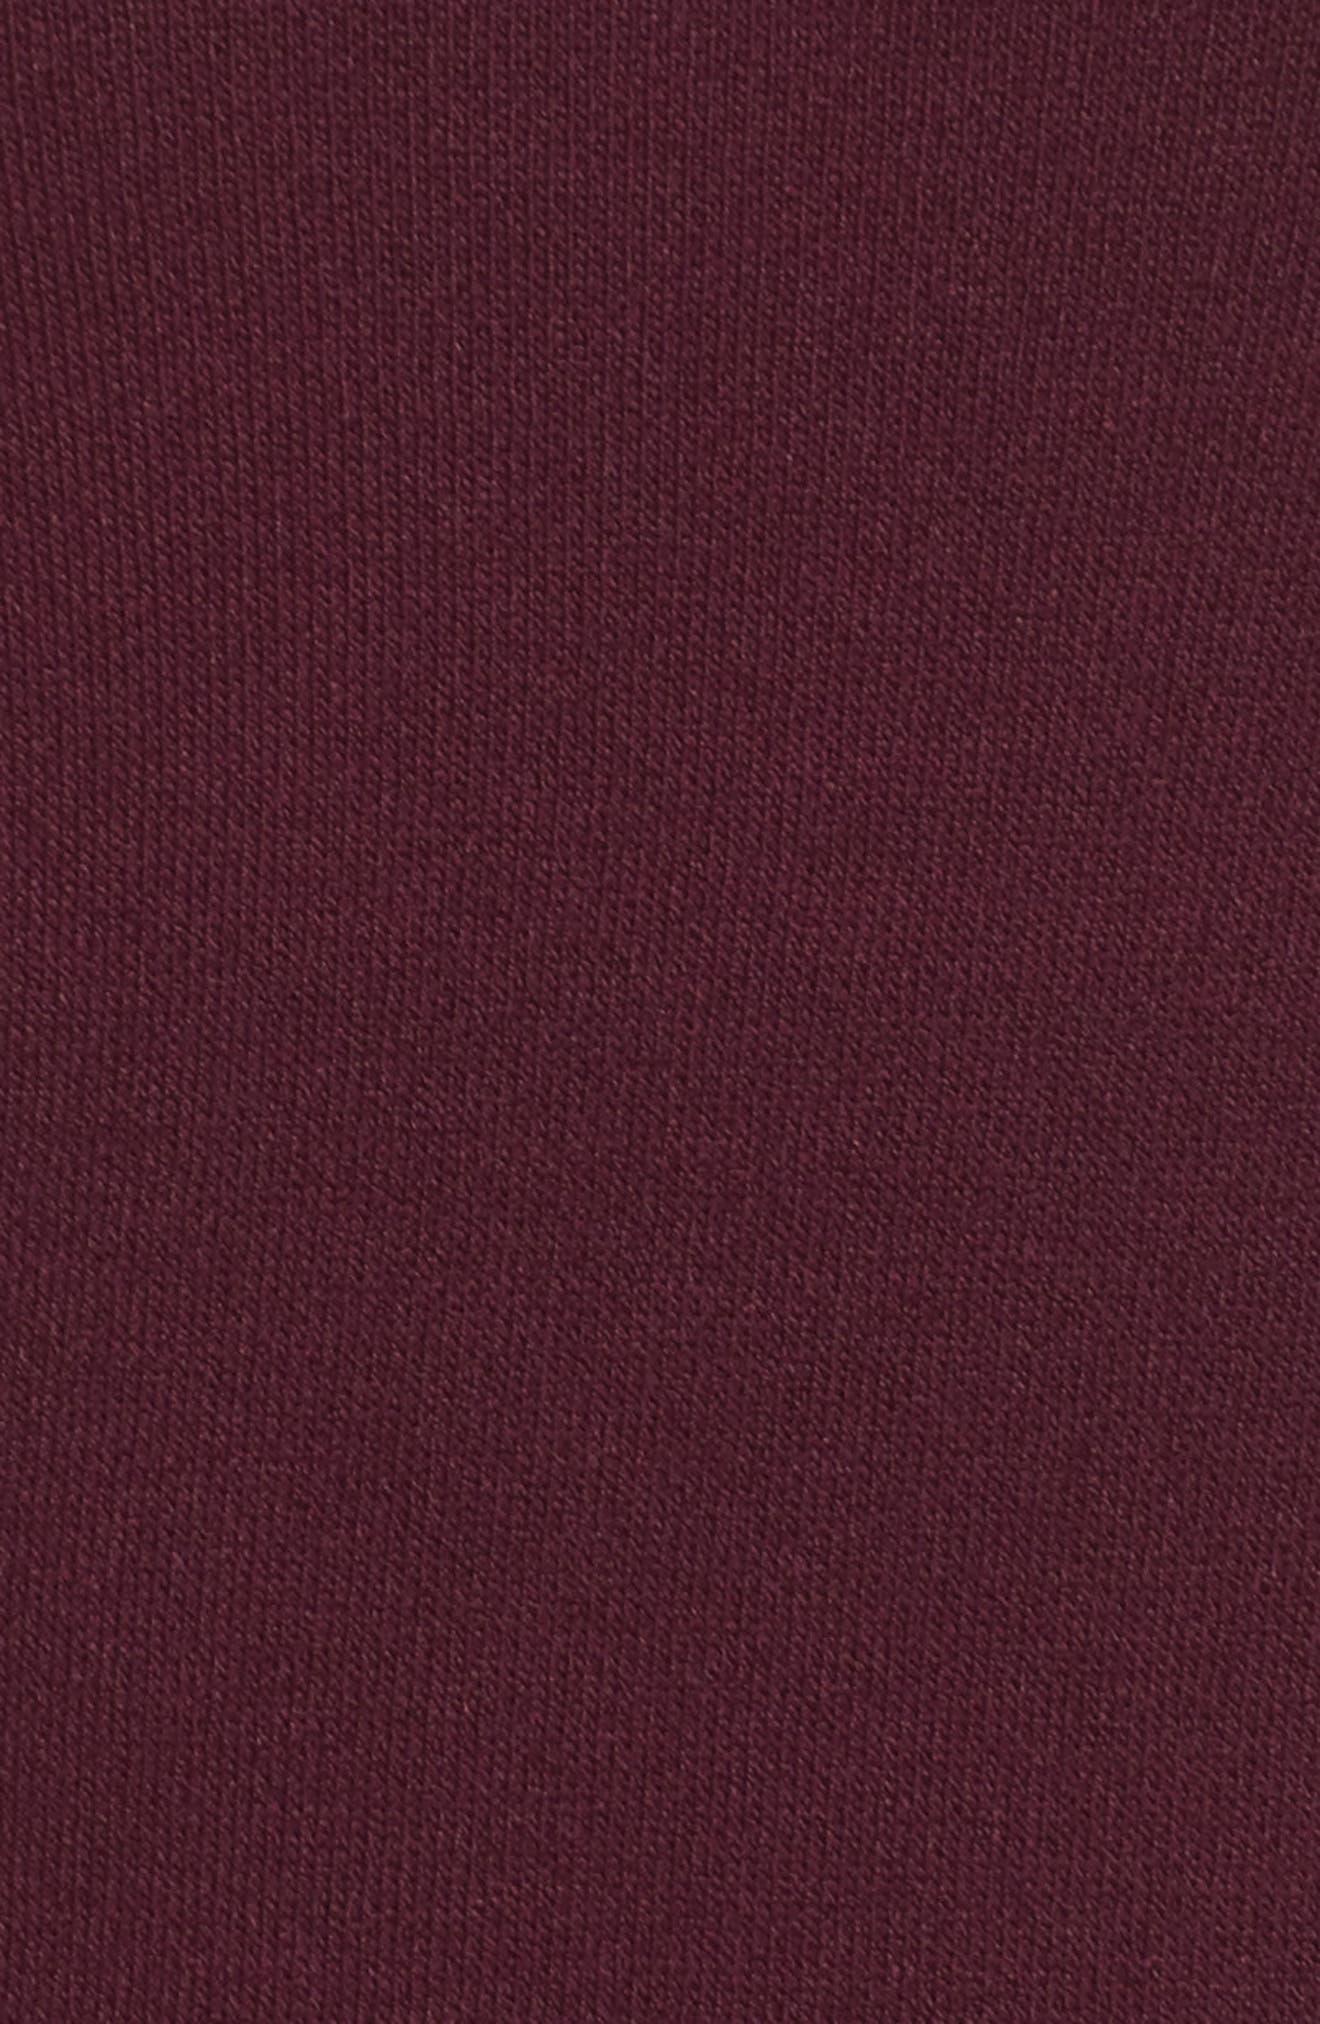 Cold Shoulder Knit Body-Con Dress,                             Alternate thumbnail 9, color,